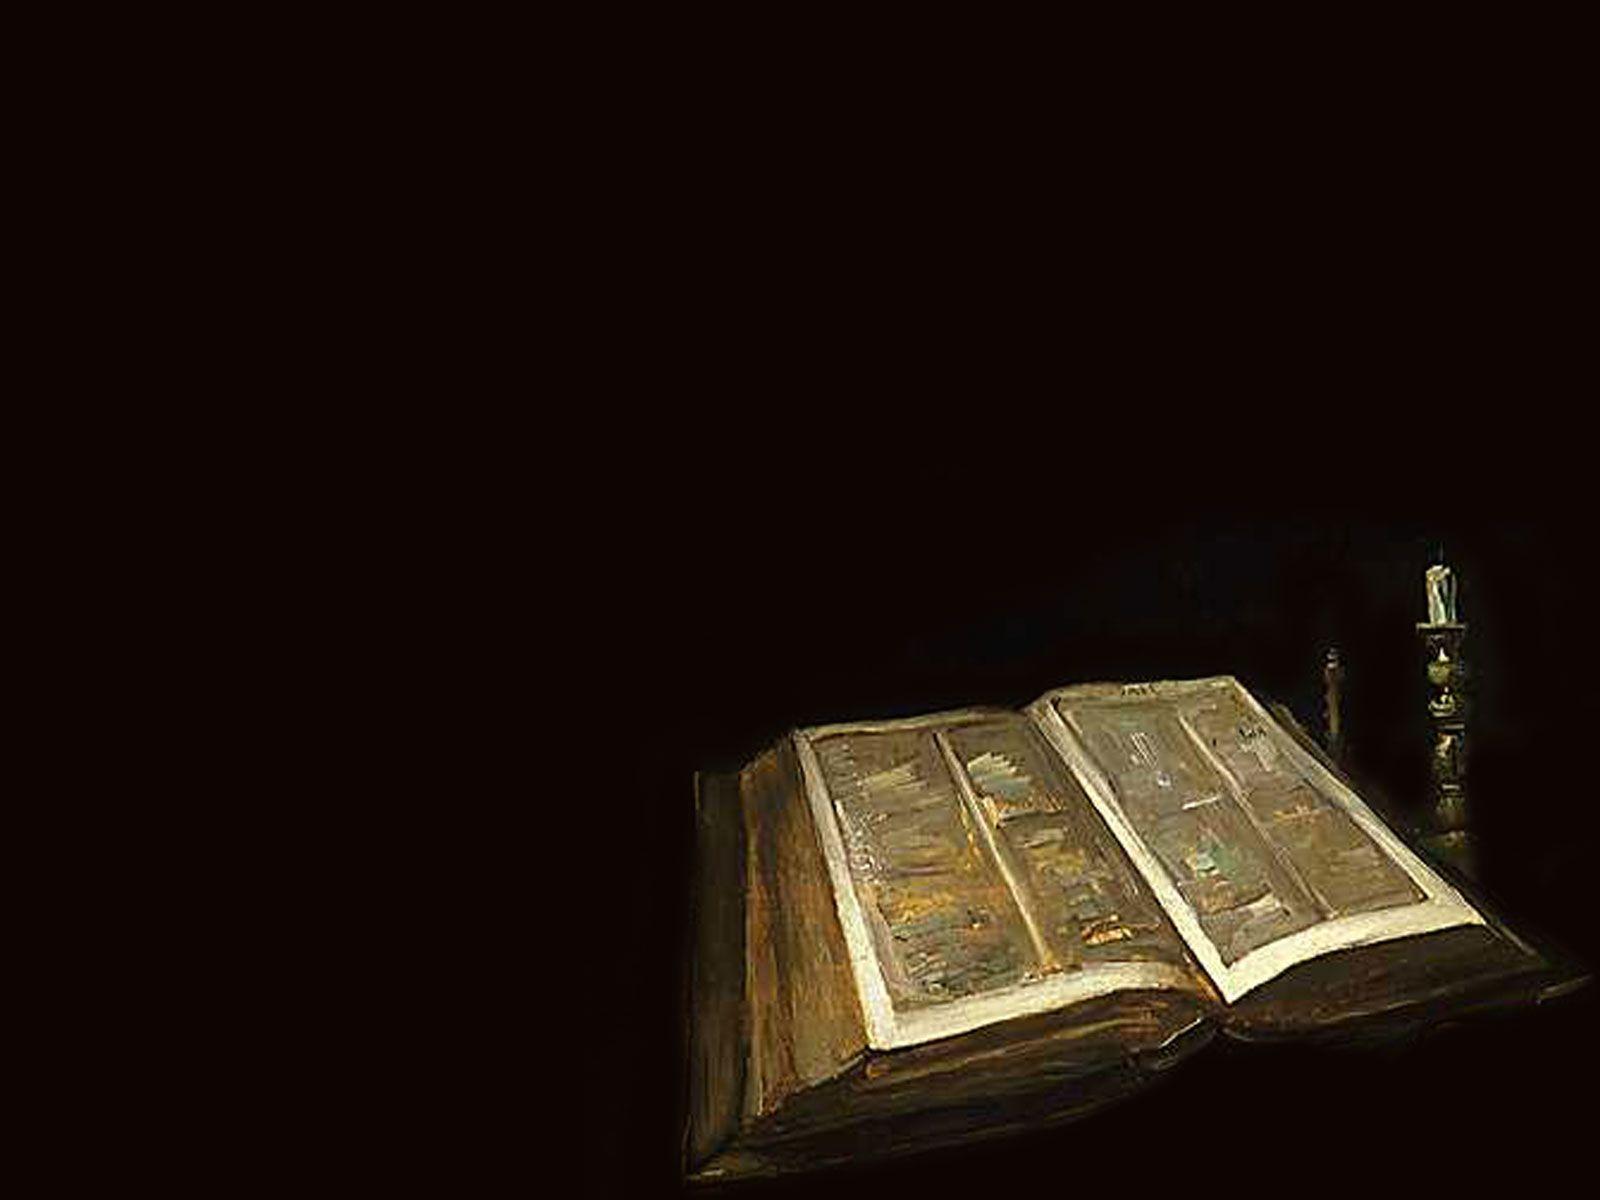 75+ Biblical Backgrounds on WallpaperSafari